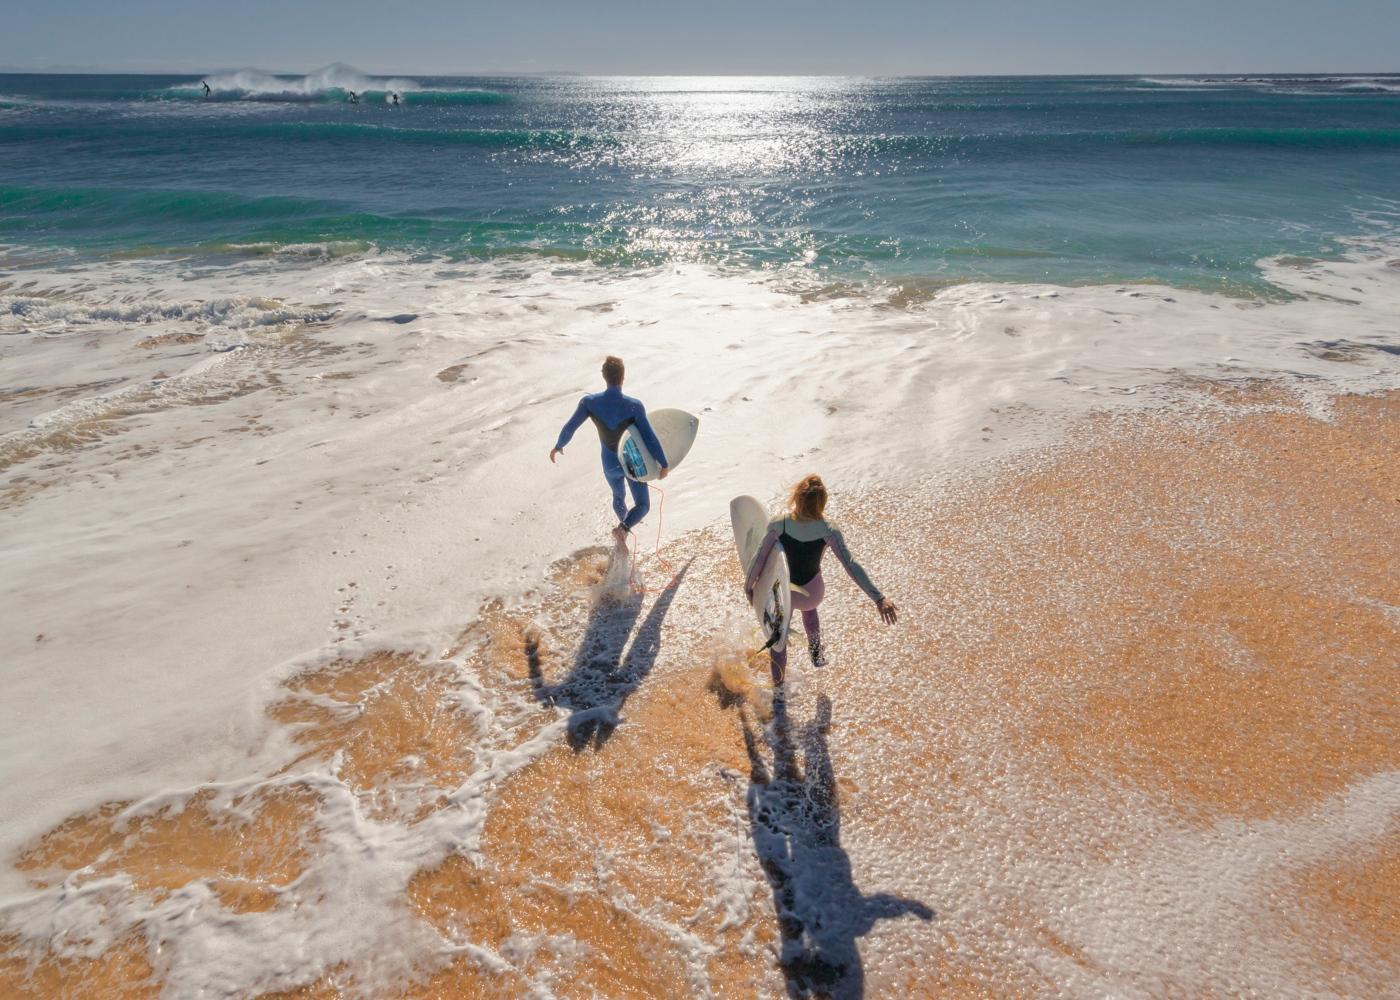 Casal a entrar no mar com pranchas de surf